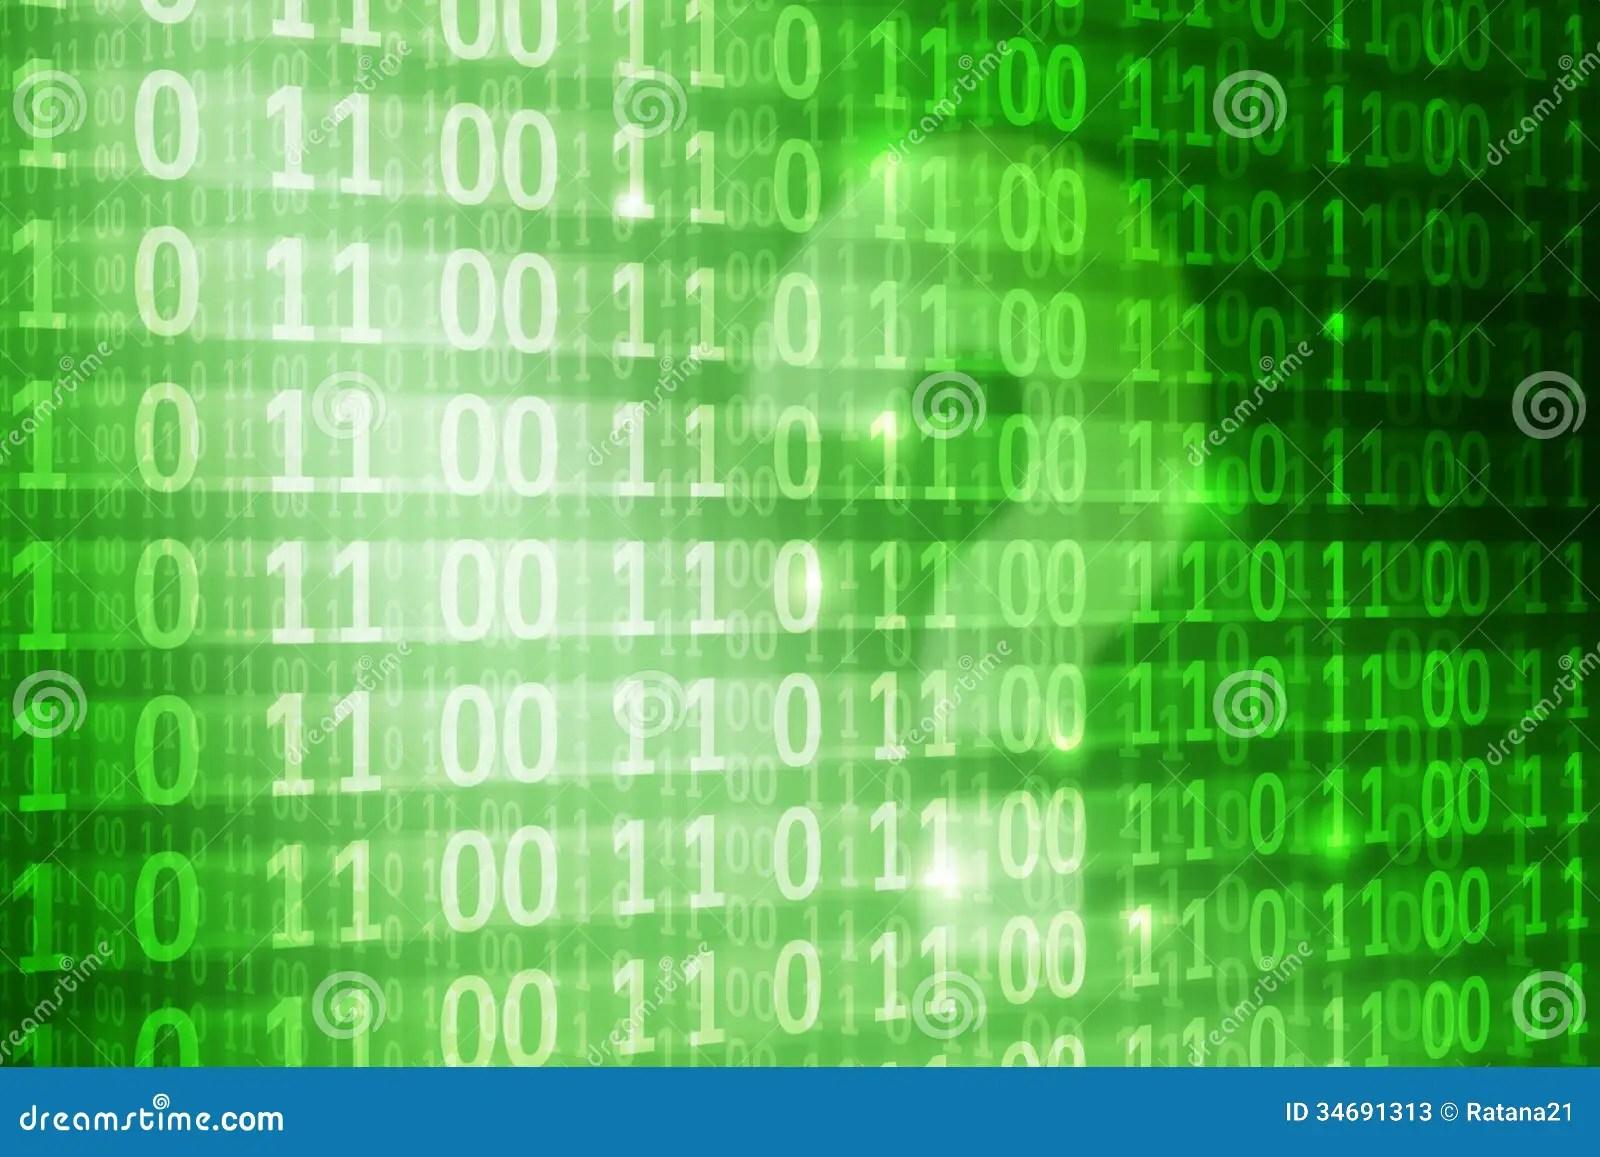 Binary Code Wallpaper Hd Question Mark On Binary Code Background Stock Illustration